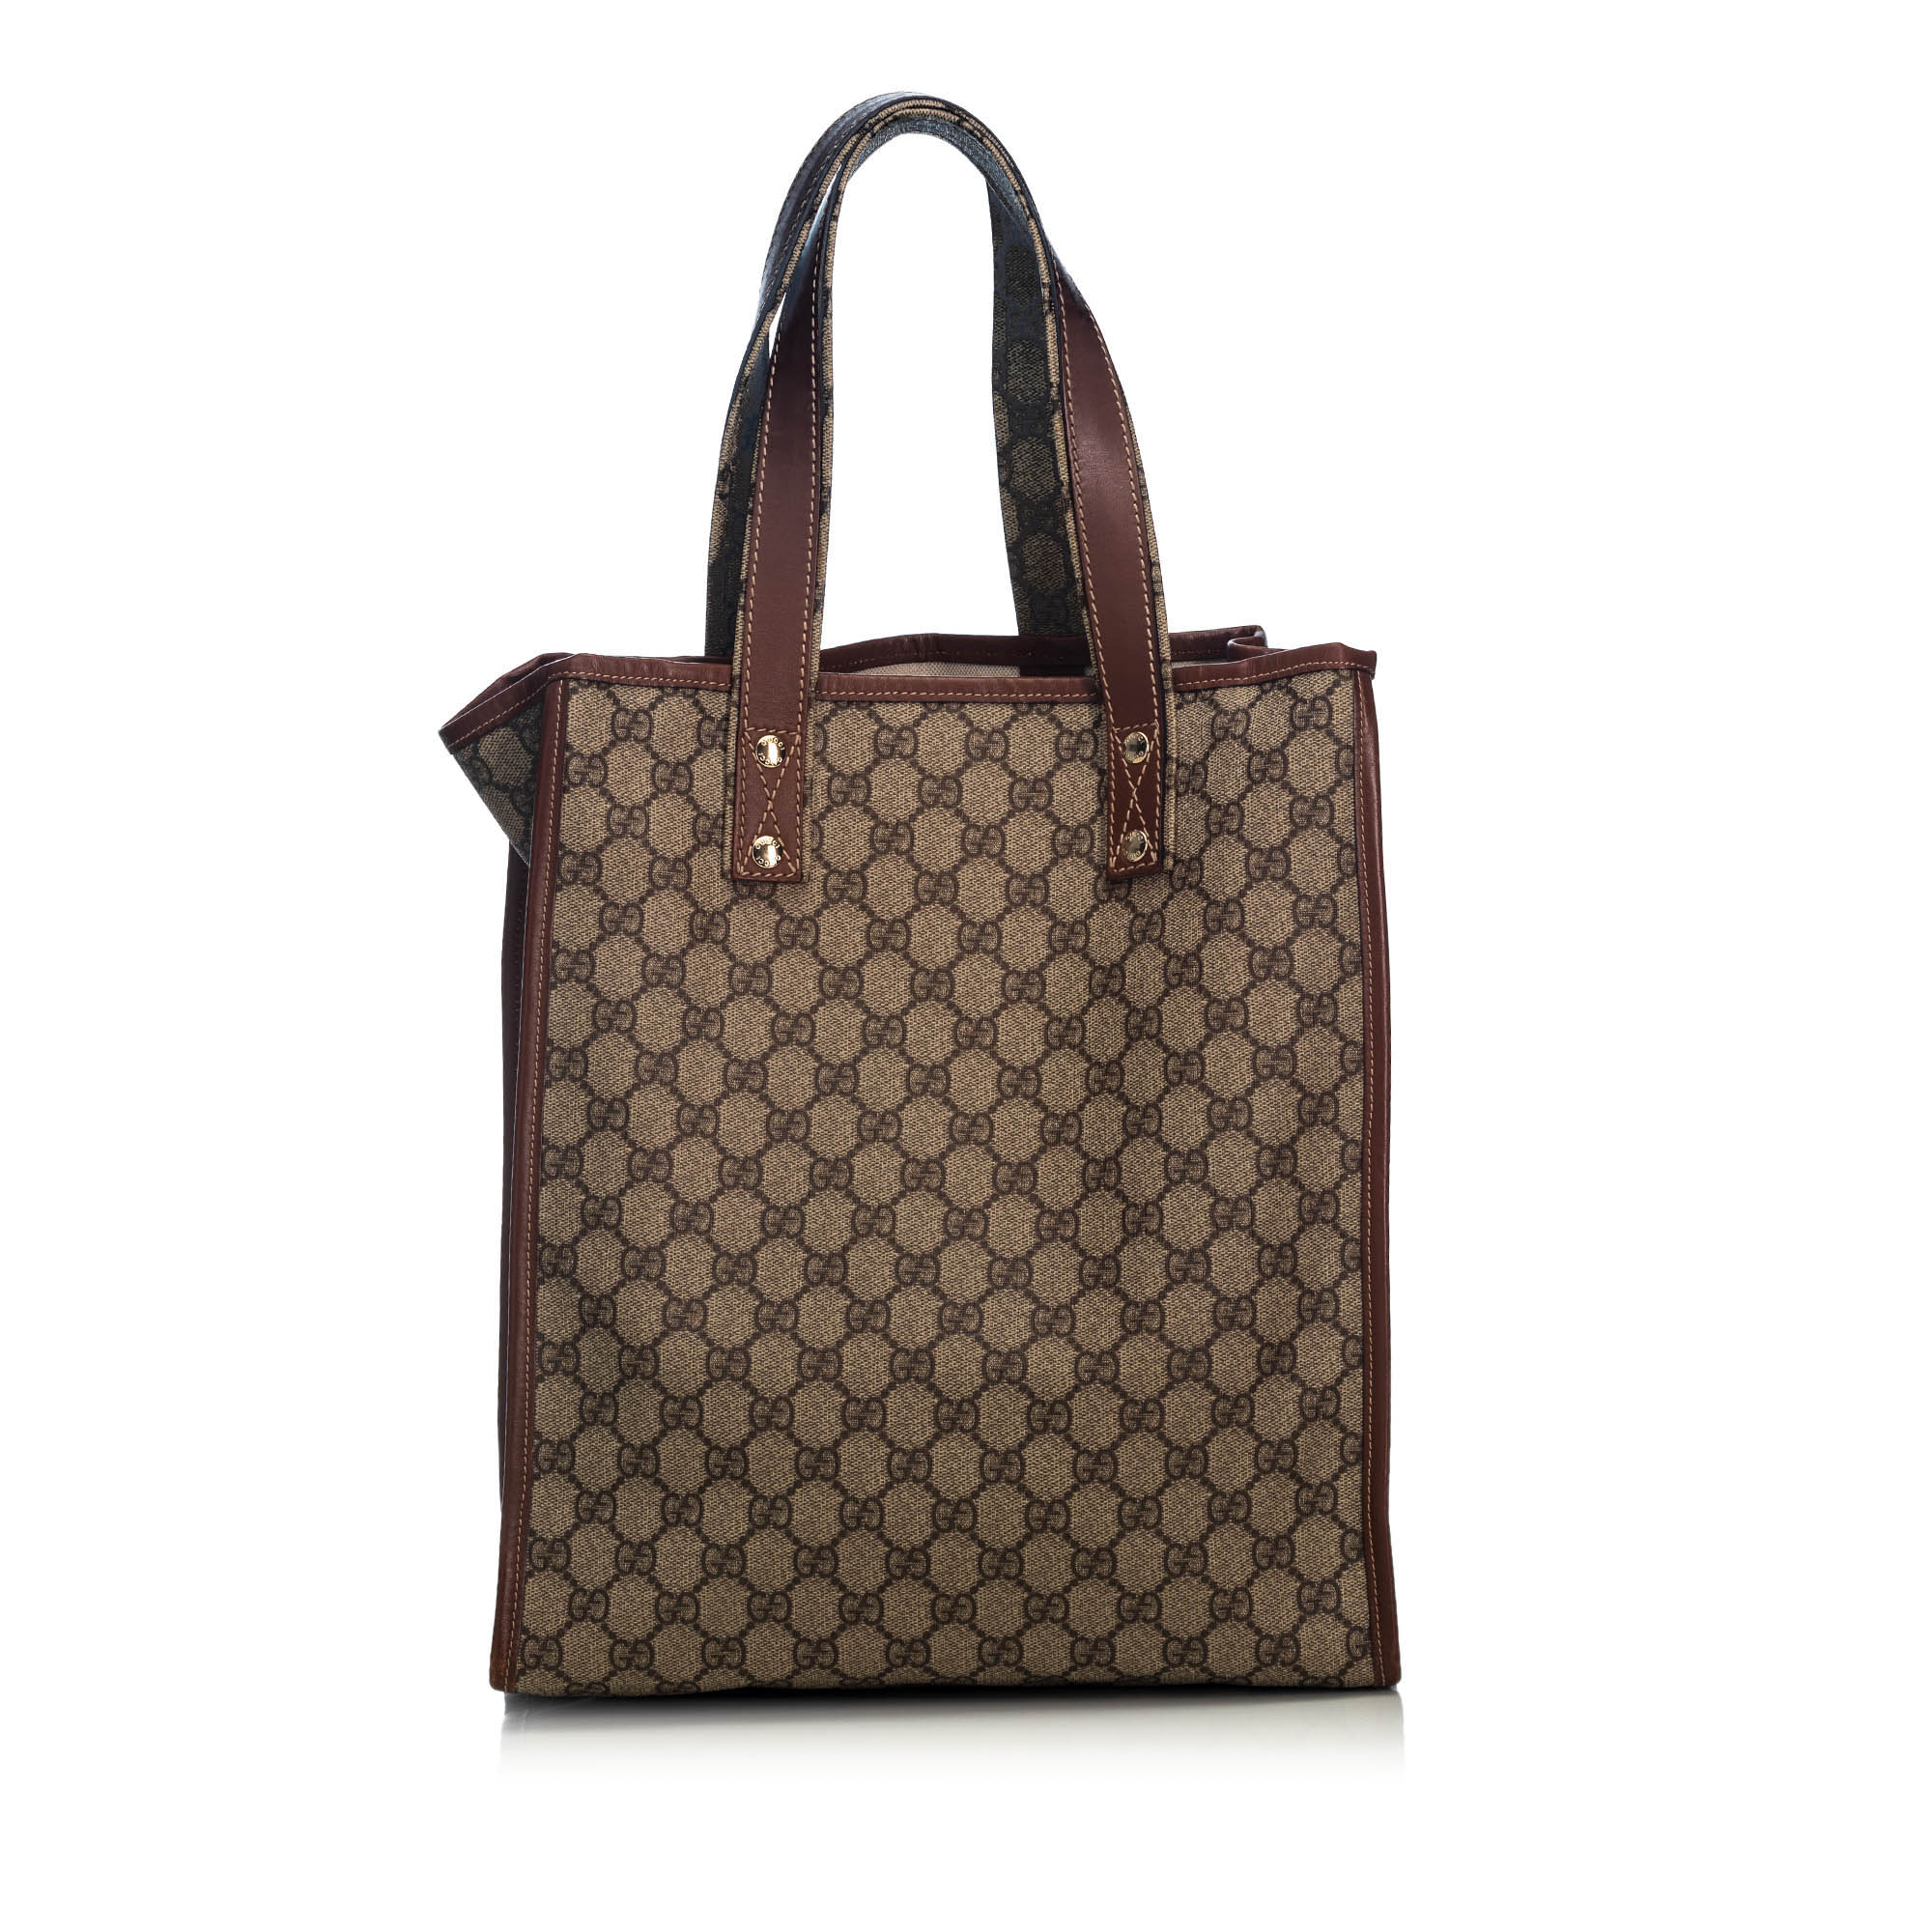 9486f5fd5c9f02 Pre-Loved Gucci Brown Beige Coated Canvas Fabric GG Supreme Web Tote ...